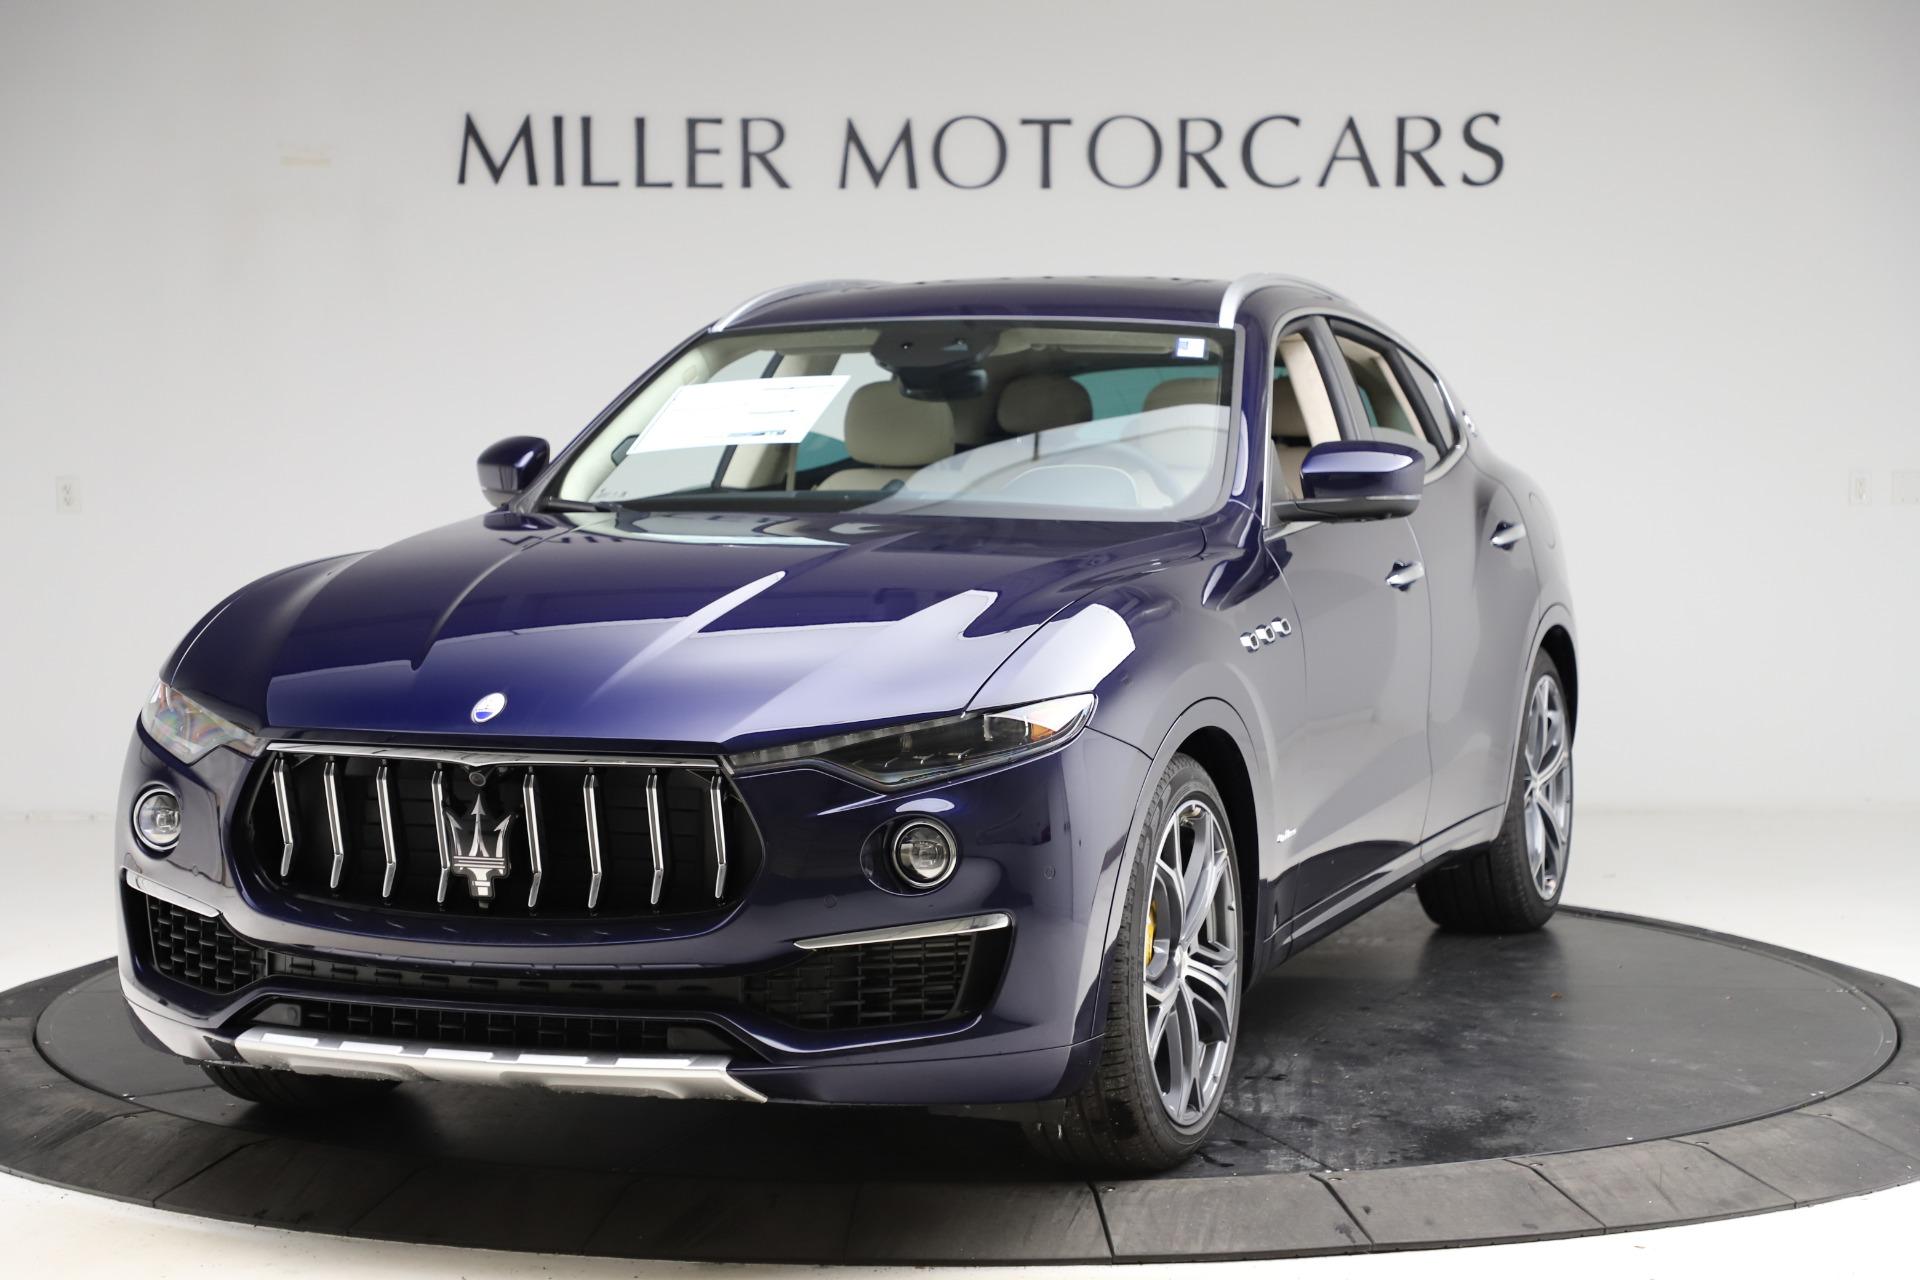 New 2021 Maserati Levante S Q4 GranLusso for sale $106,235 at Bentley Greenwich in Greenwich CT 06830 1